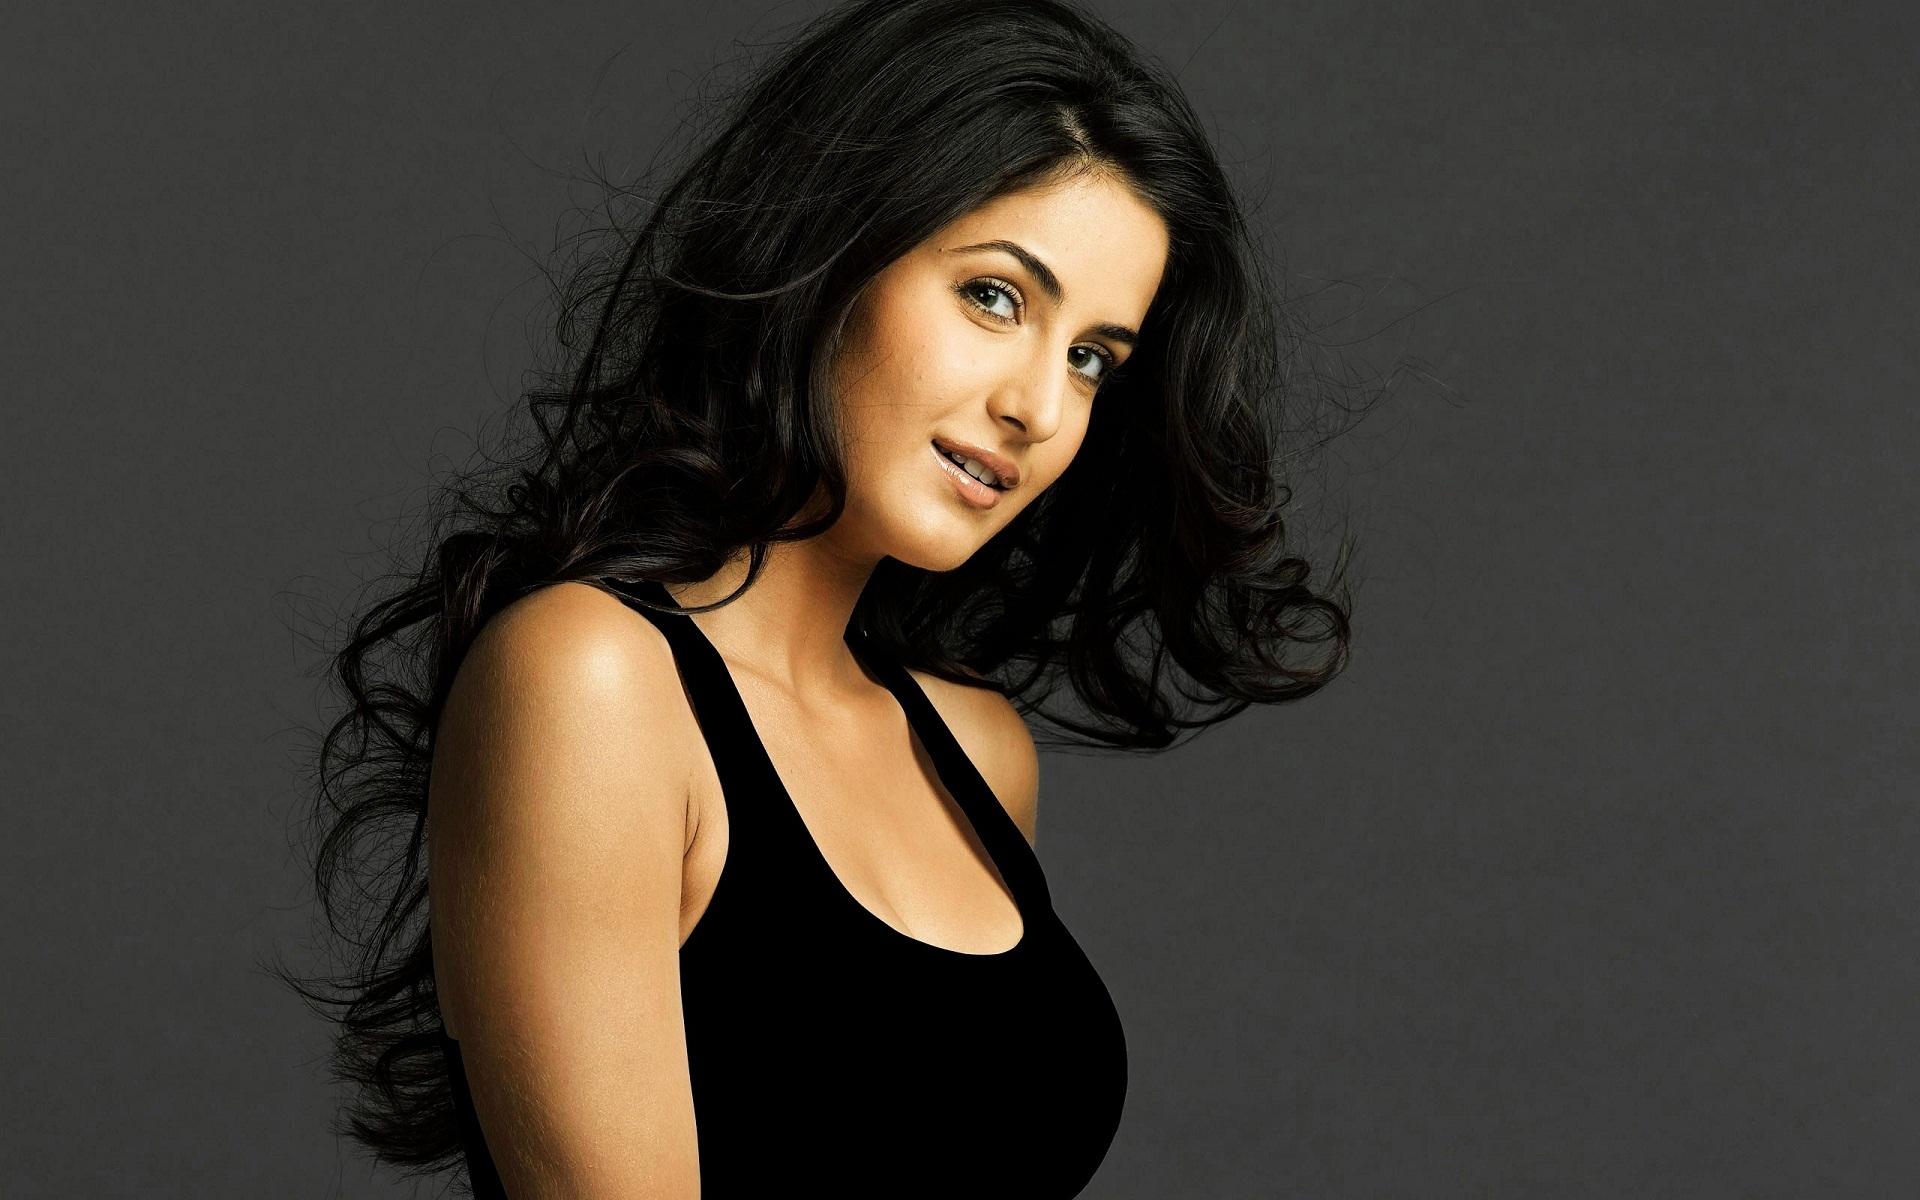 Katrina-Kaif-in-black-shirt-hot-wide-HD-wallpaper